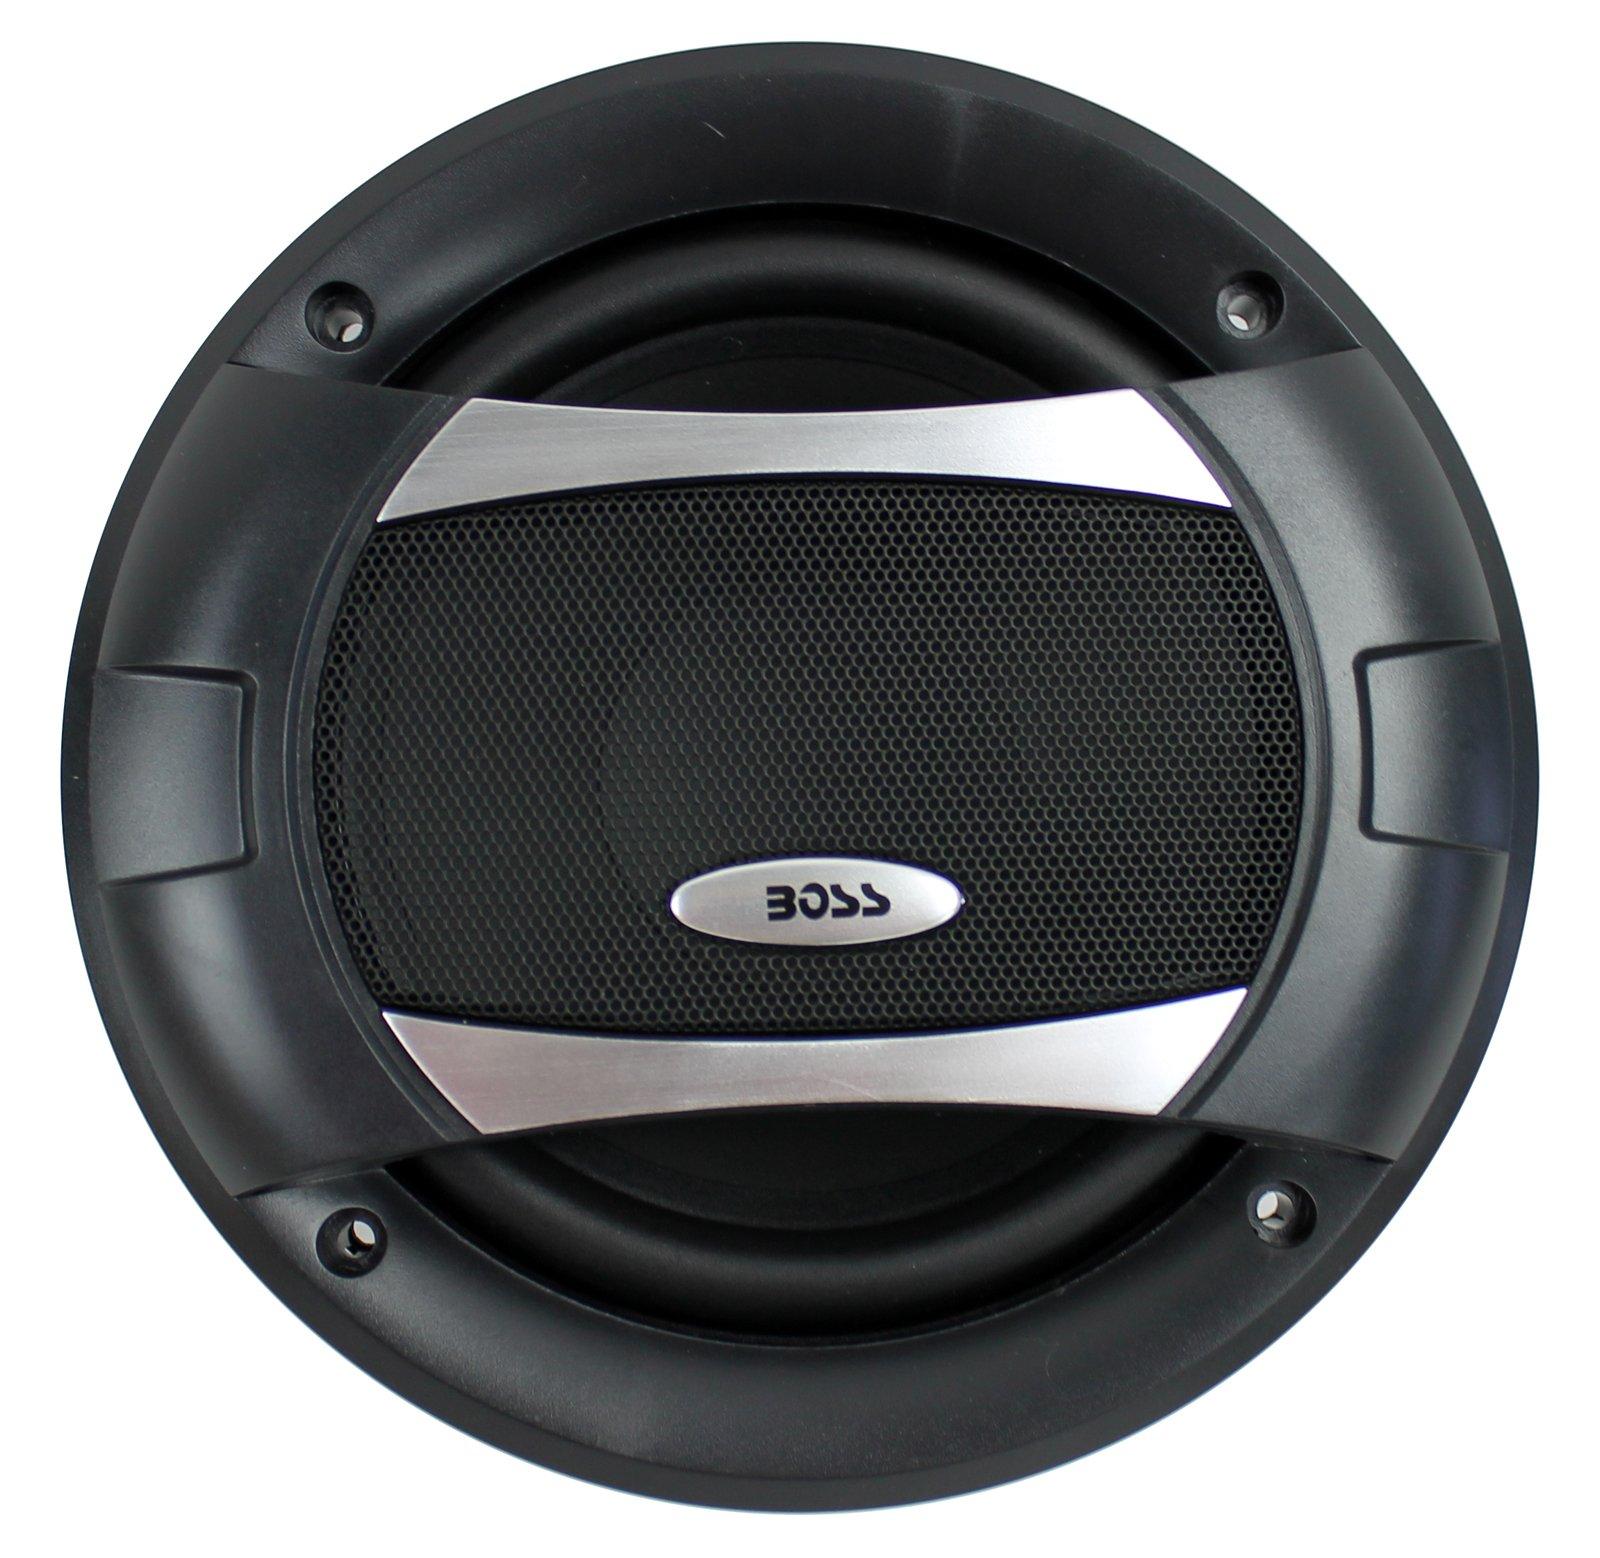 BOSPC652C - Boss Audio 6.5 PHNTM COMP SPKR WITH by BOSS Audio (Image #2)